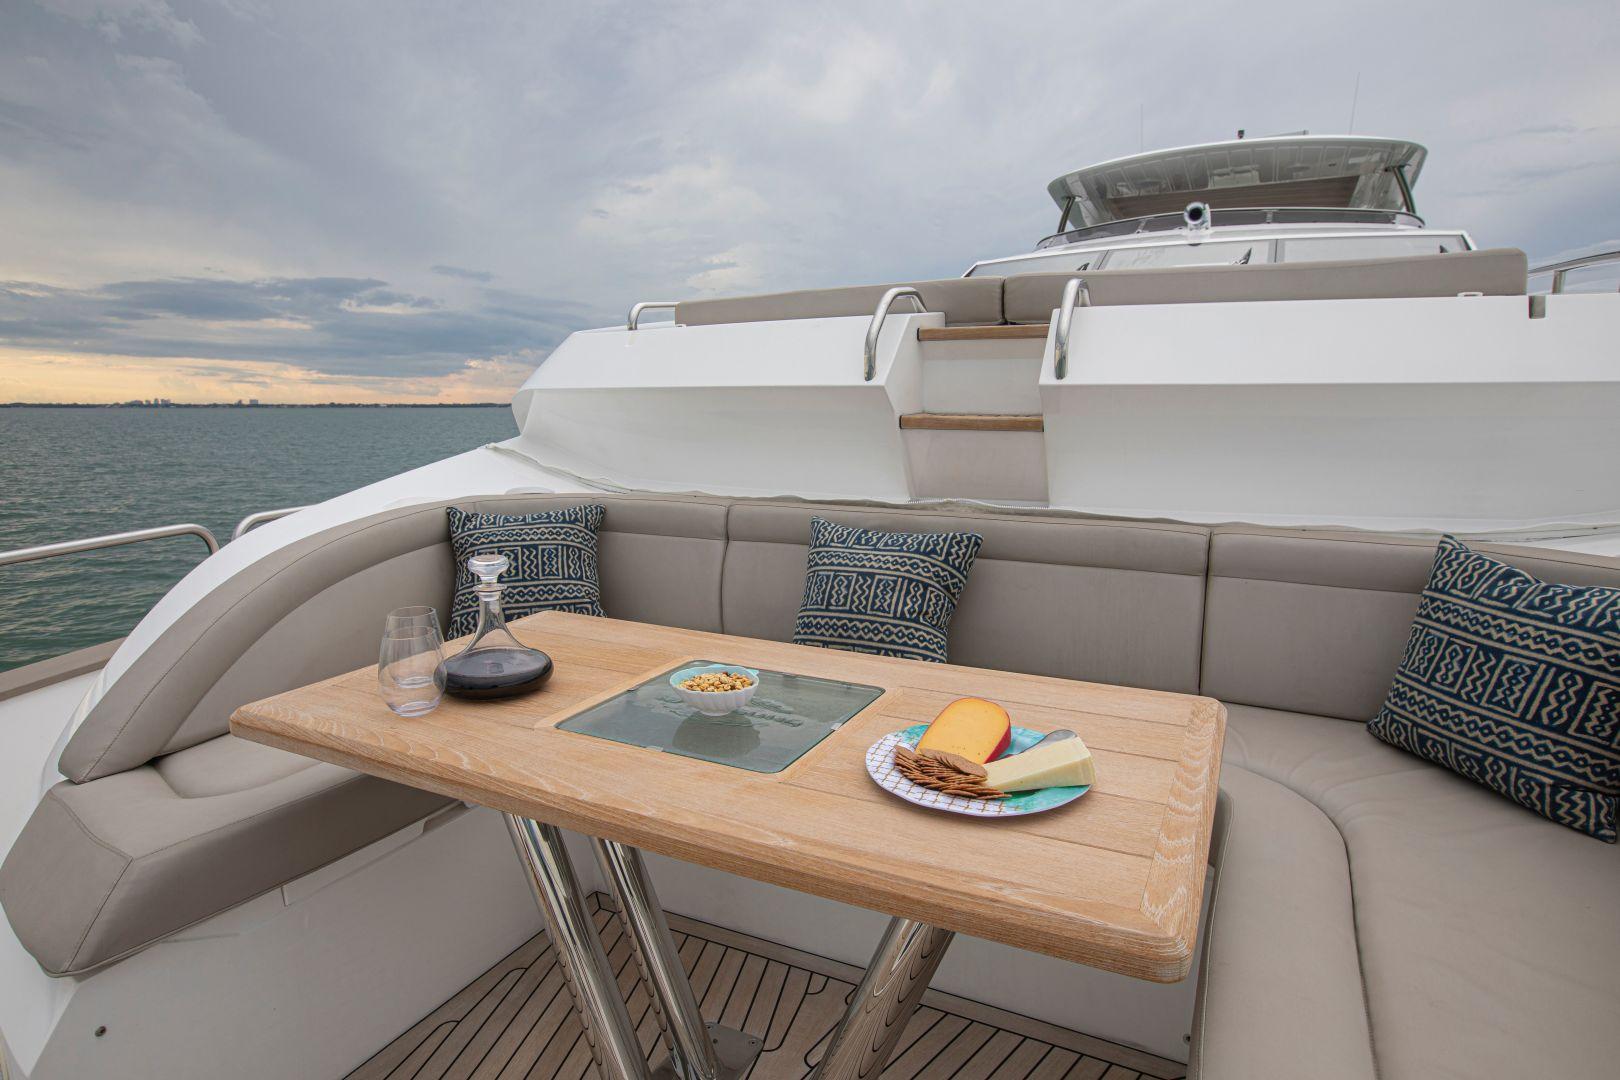 Sunseeker-95 Yacht 2017-Perseverance 3 Ft Lauderdale-Florida-United States-1400114   Thumbnail